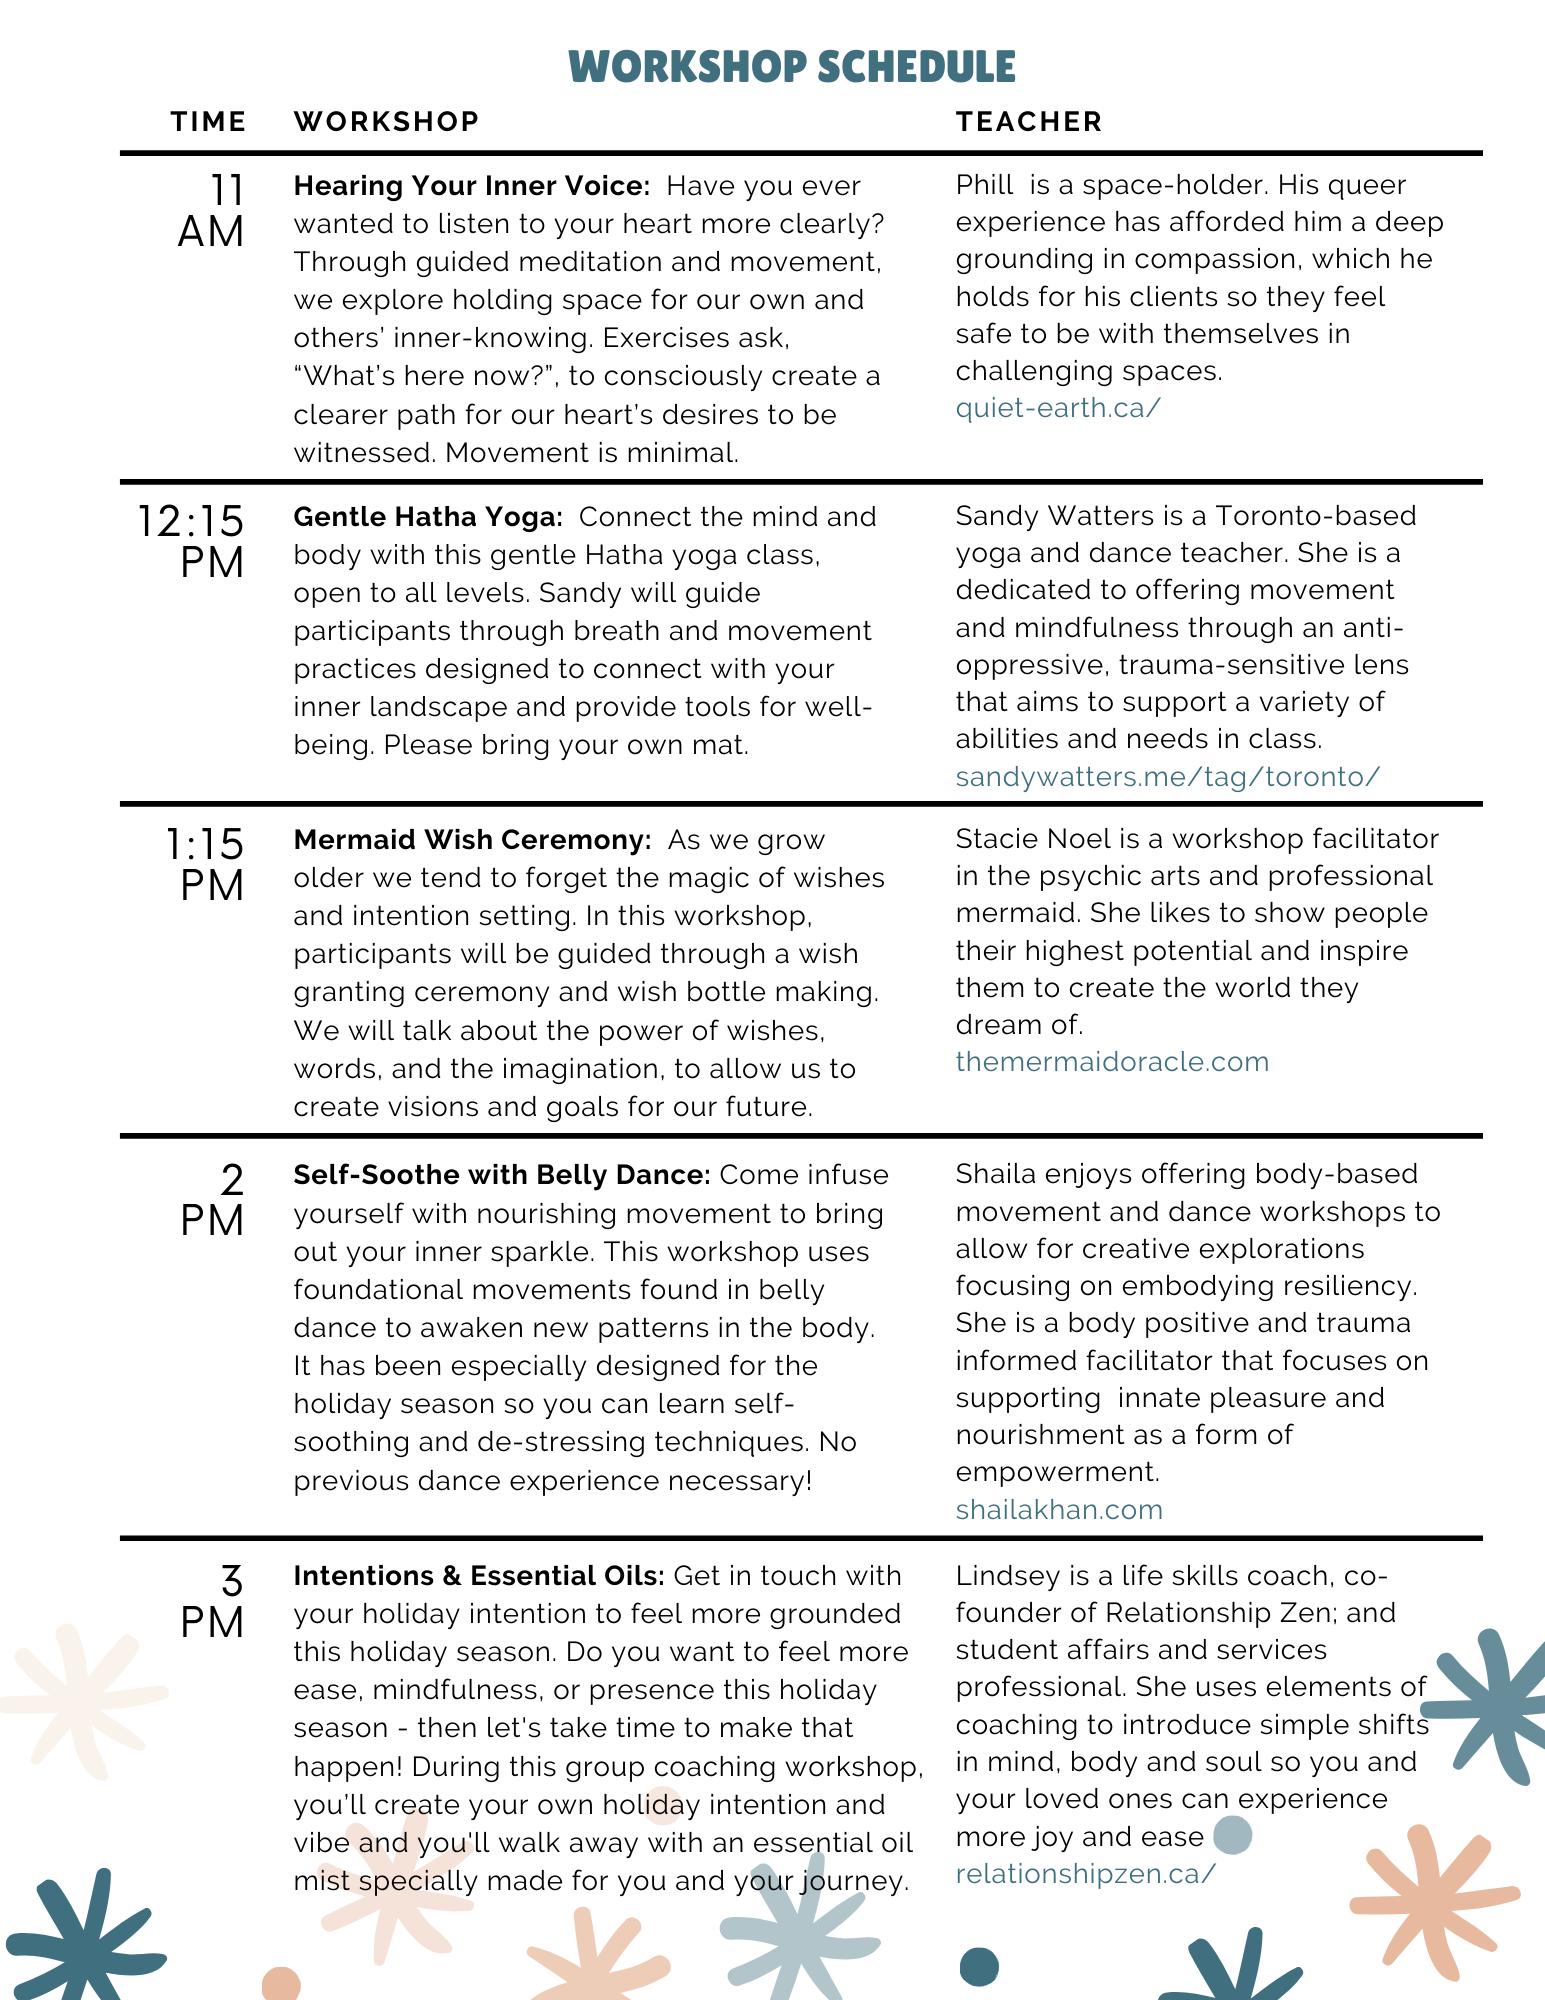 eventbrite schedule